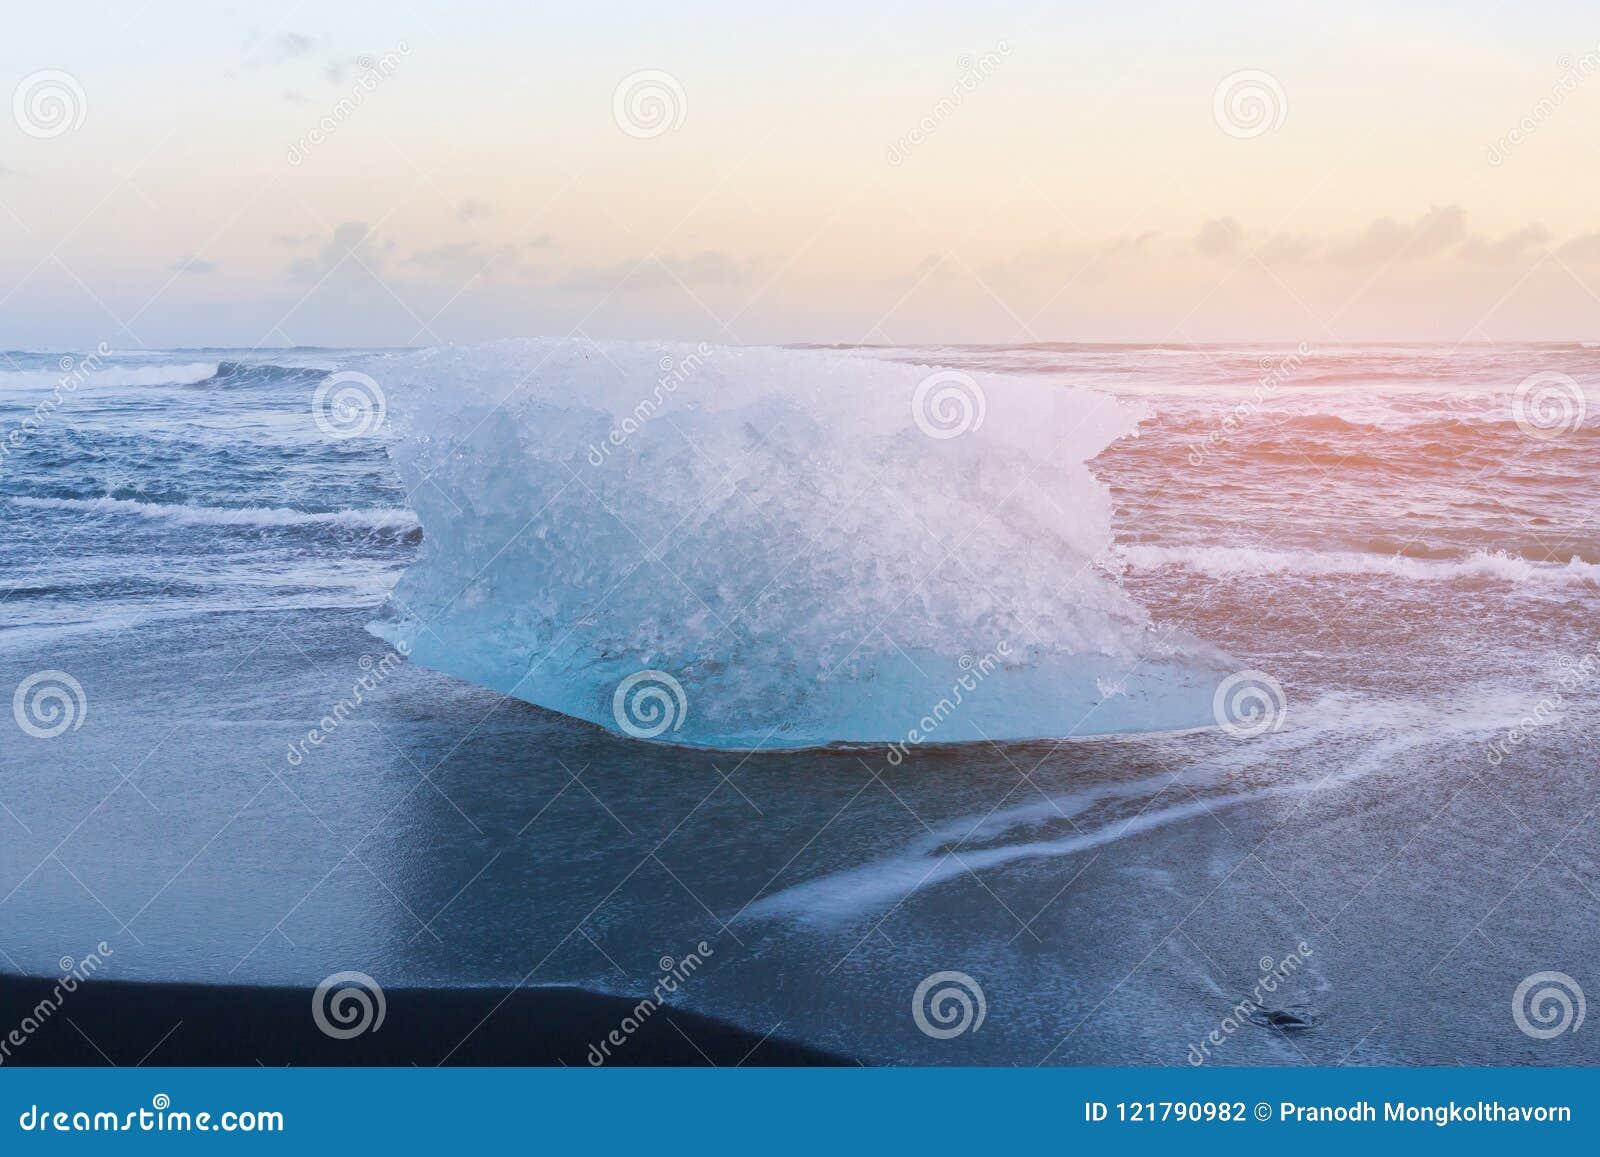 Black Diamond Sand Beach Iceland Stock Photo Image Of Iceberg